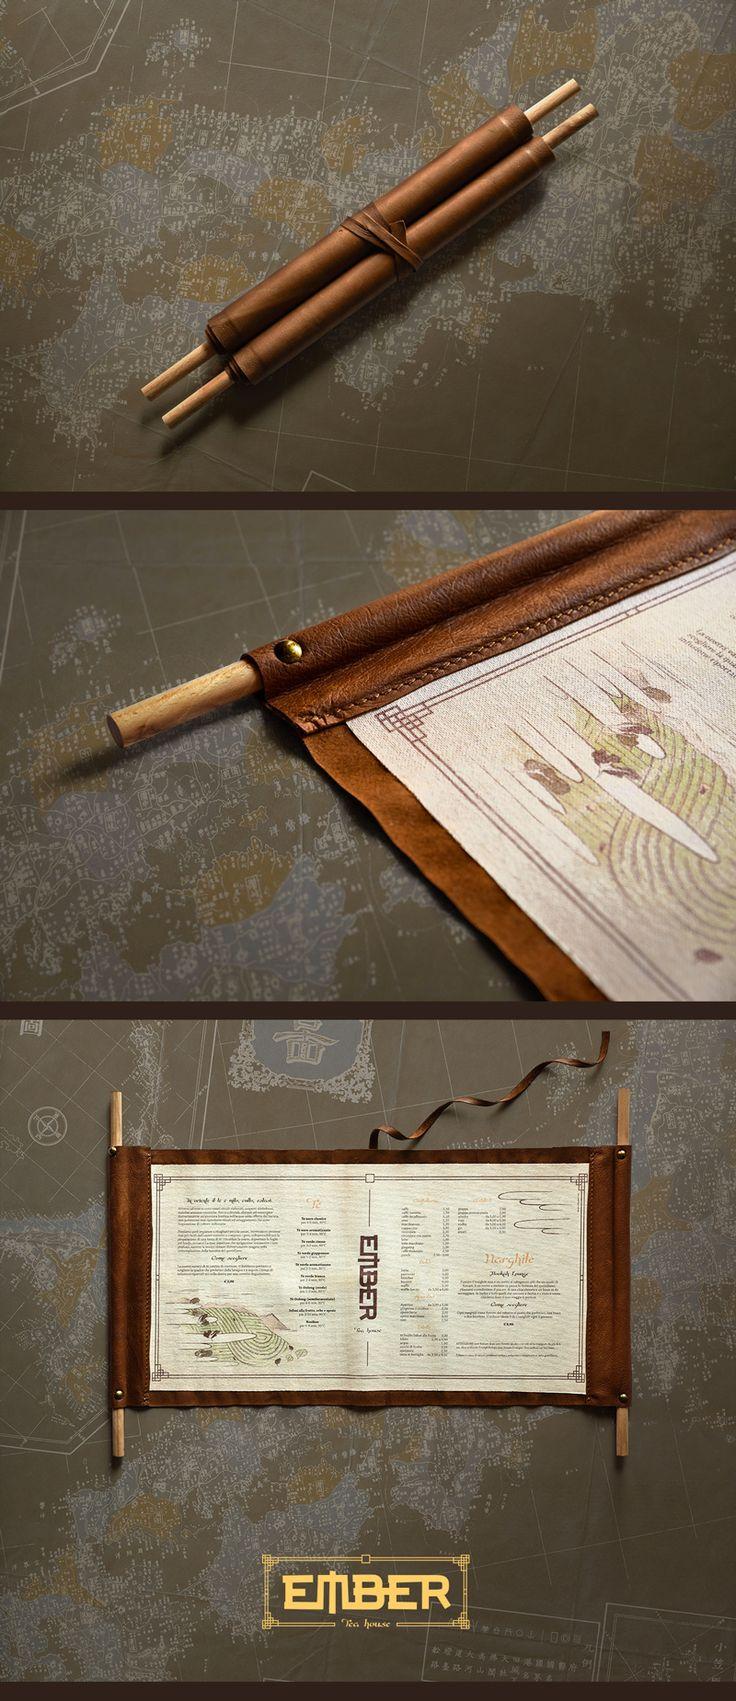 Ember Tea House menu | www.ofmagnet.com #graphic #design #menu #tea #teahouse #teatime #pub #café #east #japan #layout #vertical #handmade #wood #leather